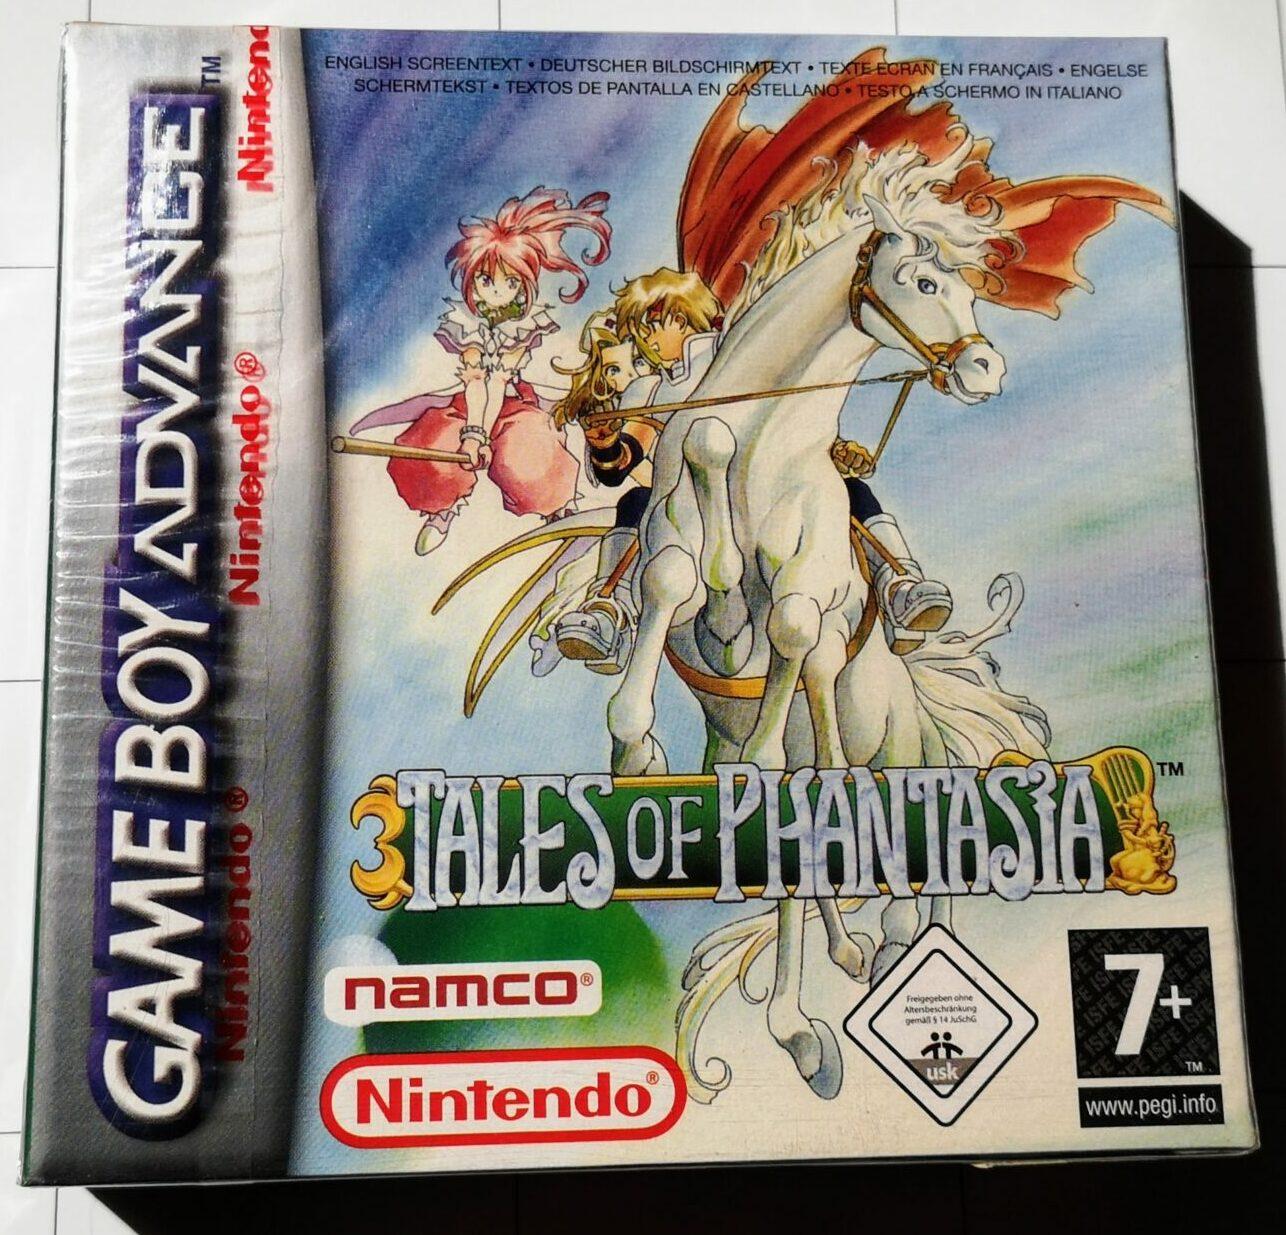 Tales of Phantasia (2006 Nintendo Game Boy Advance), dettaglio colori copertina frontale